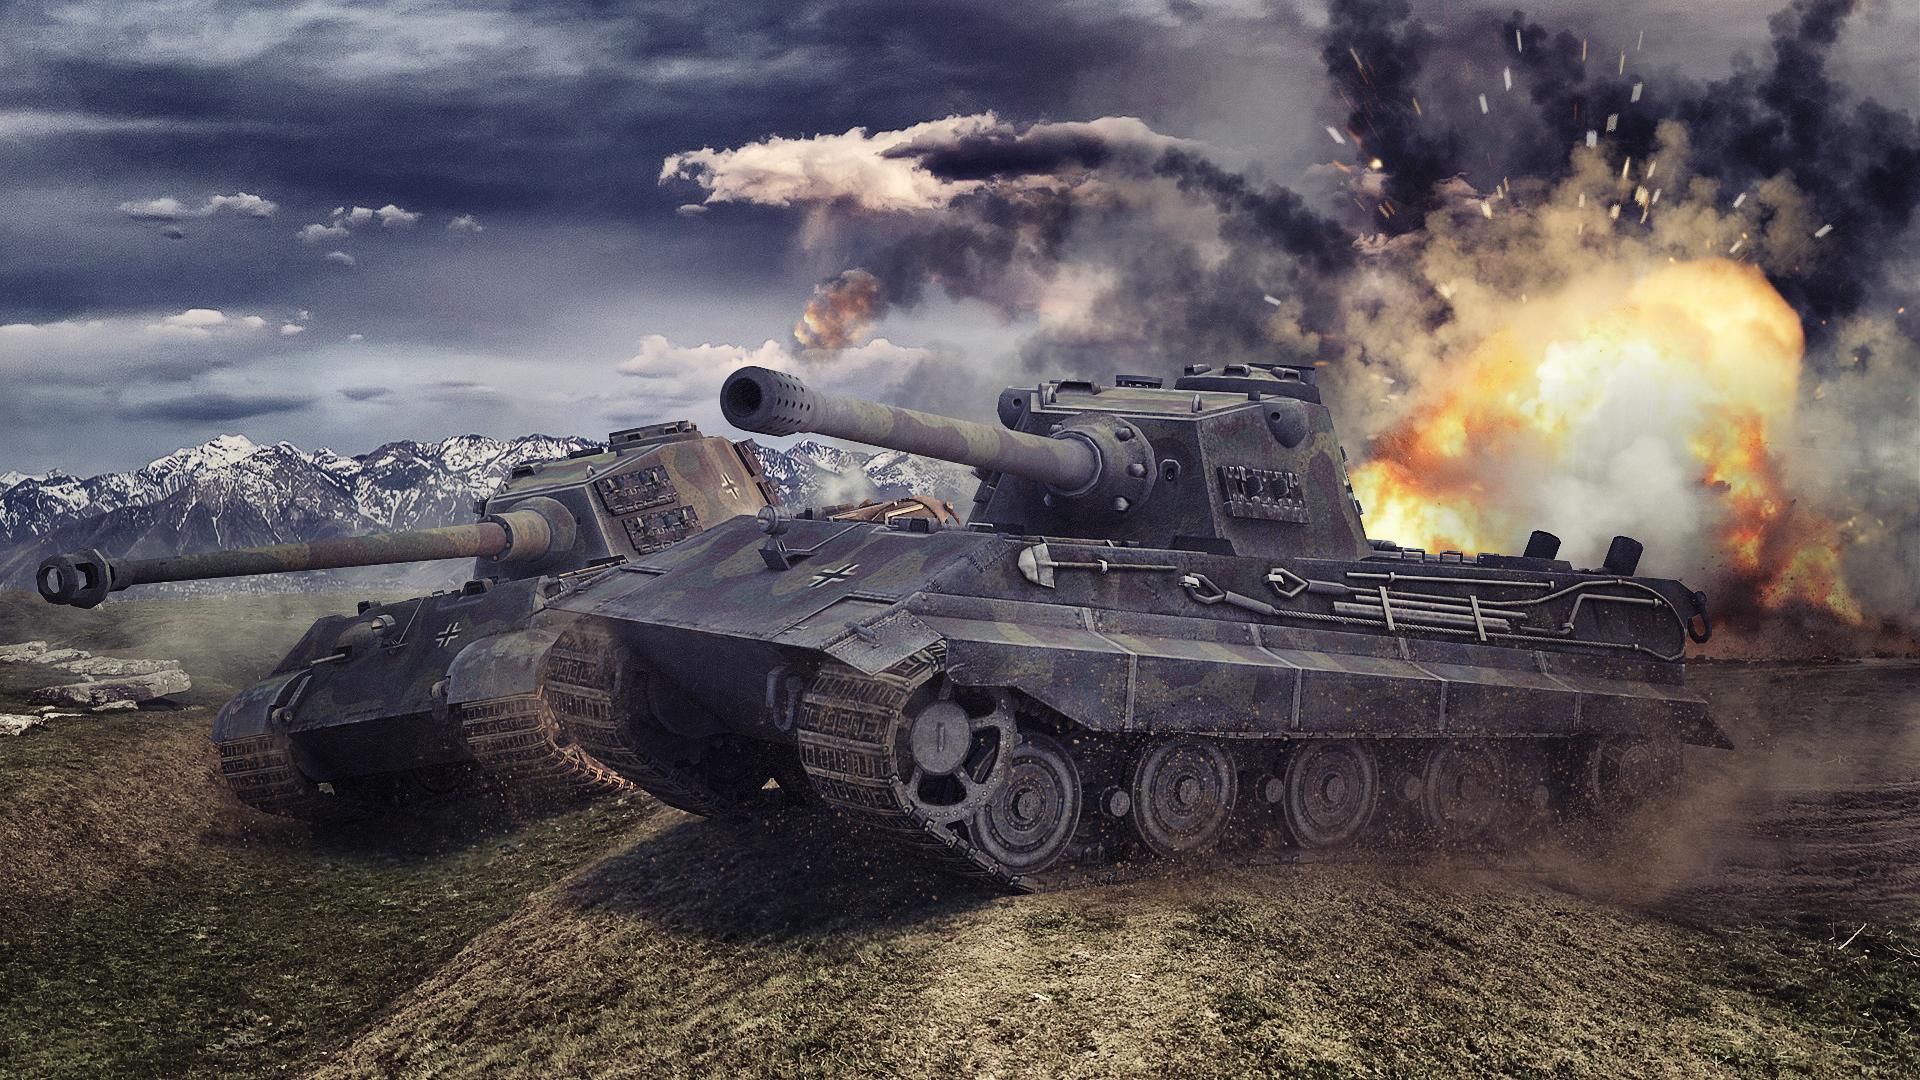 Forumworldoftanksxbox360editioncom e75 not even funny - tank academy - official forum - world of